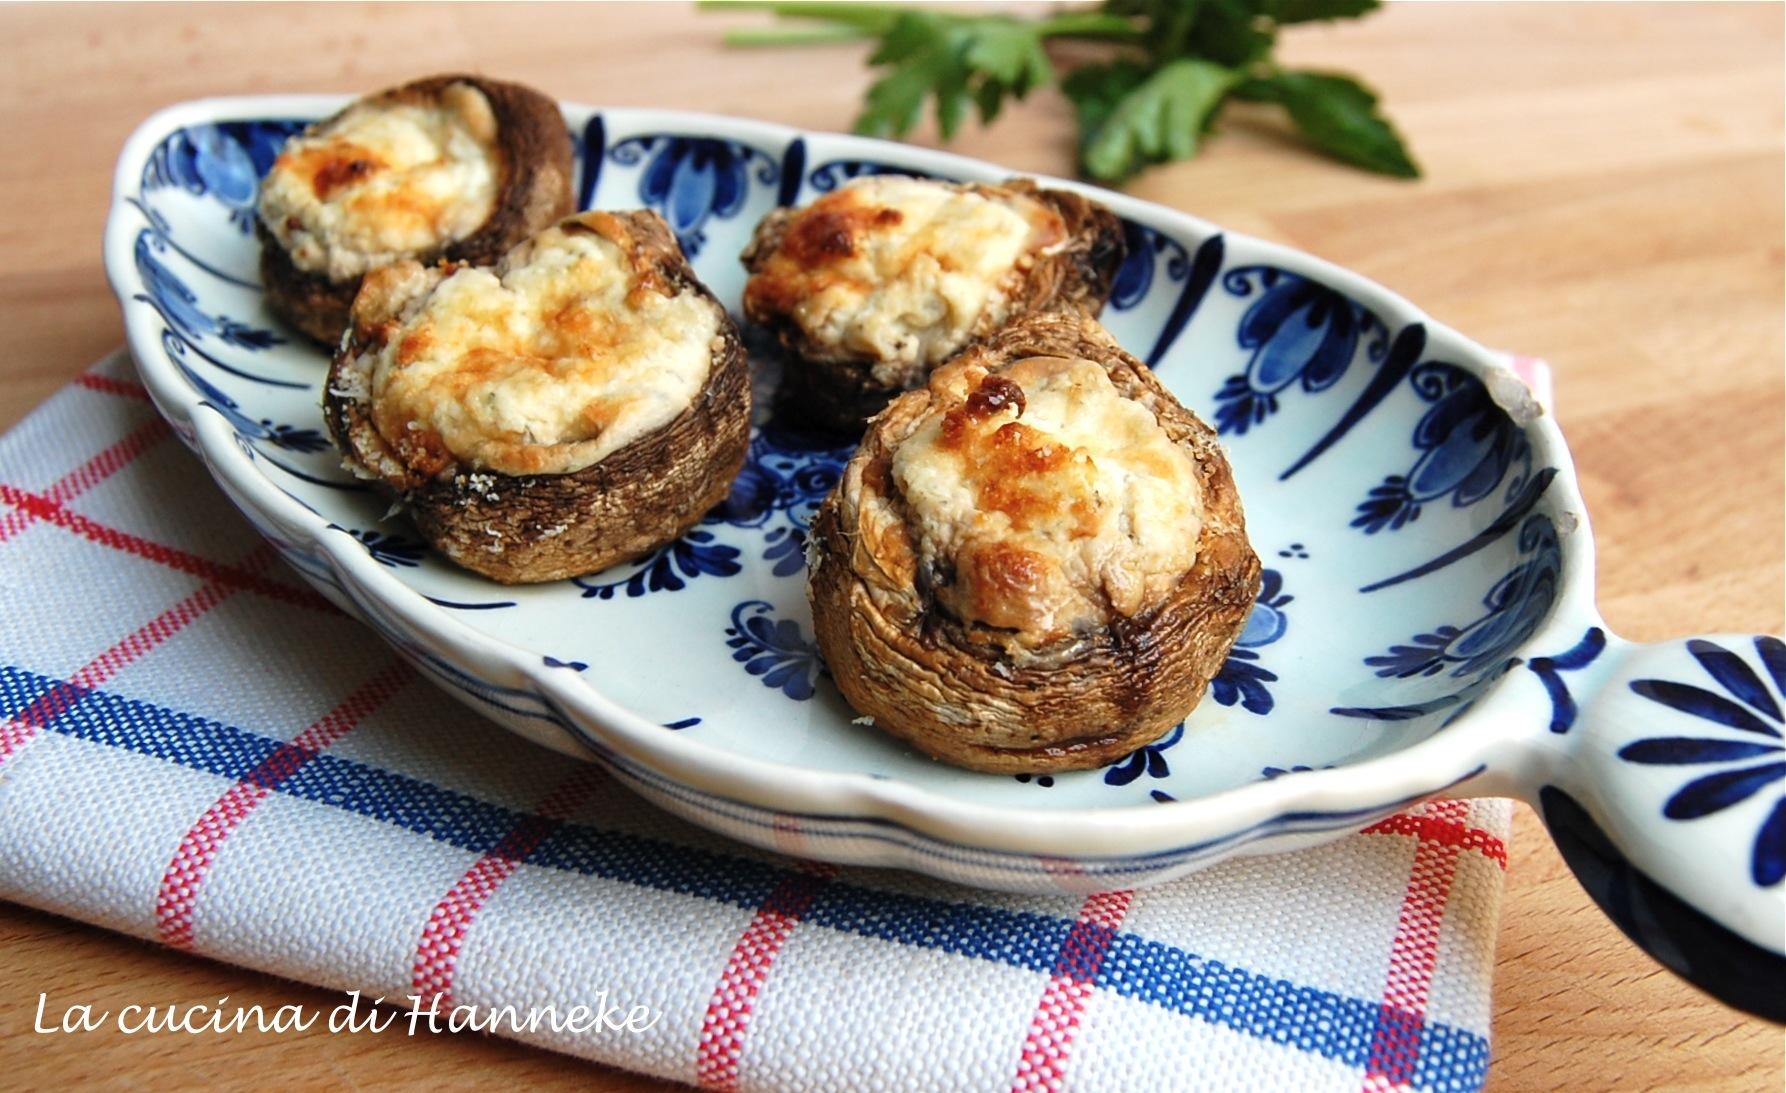 champignon gratinati